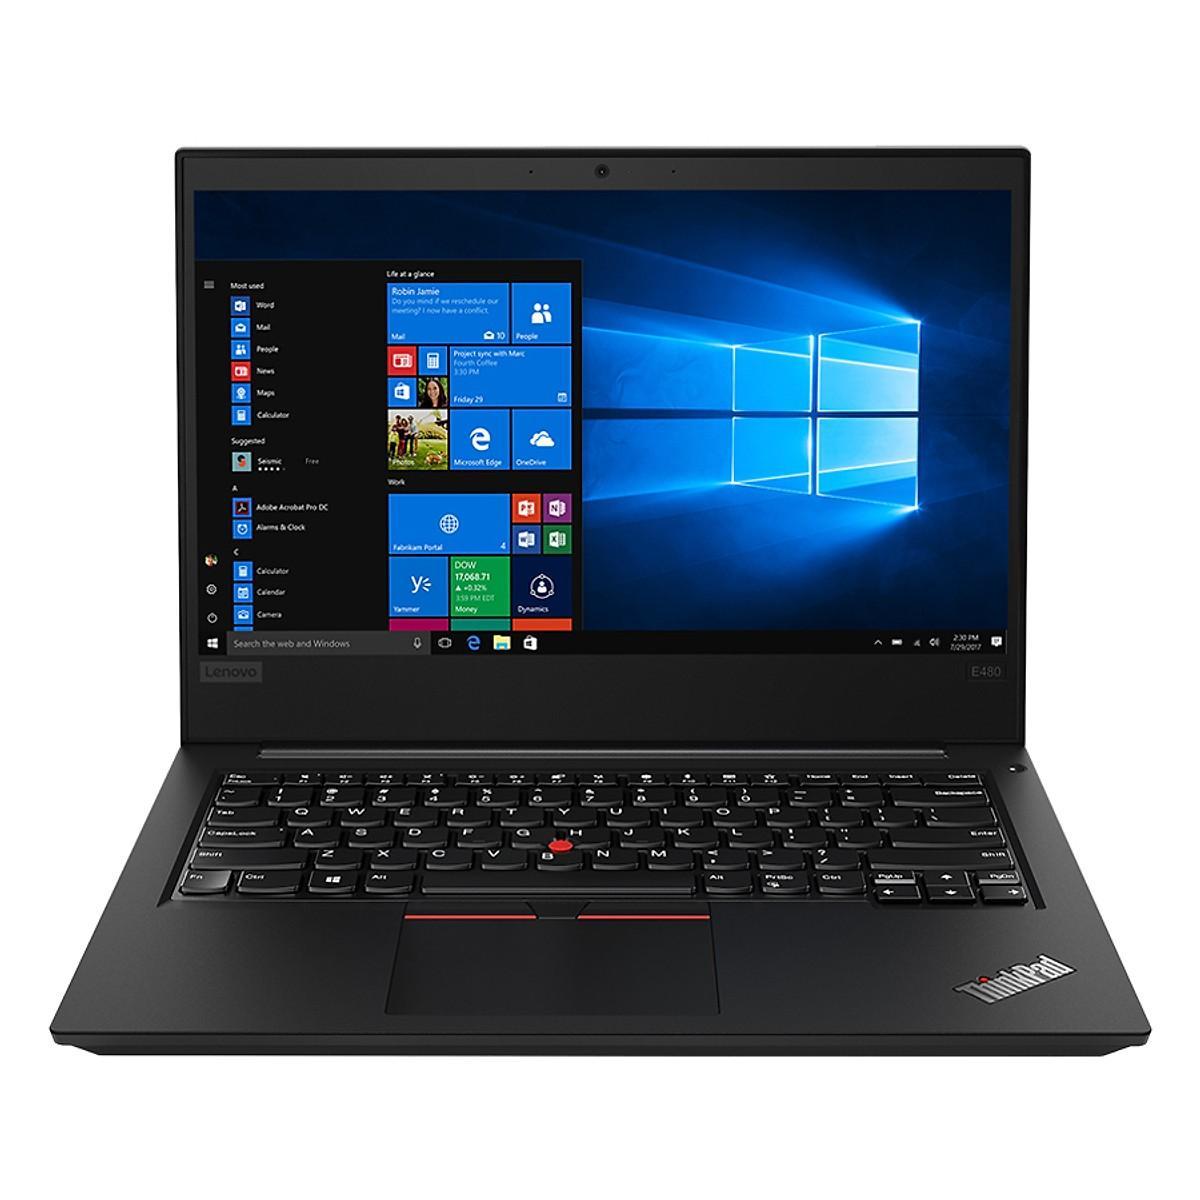 Laptop Lenovo ThinkPad Edge E480 20KN005HVN Core i5-8250U/Win10 (14 inch) (Black)